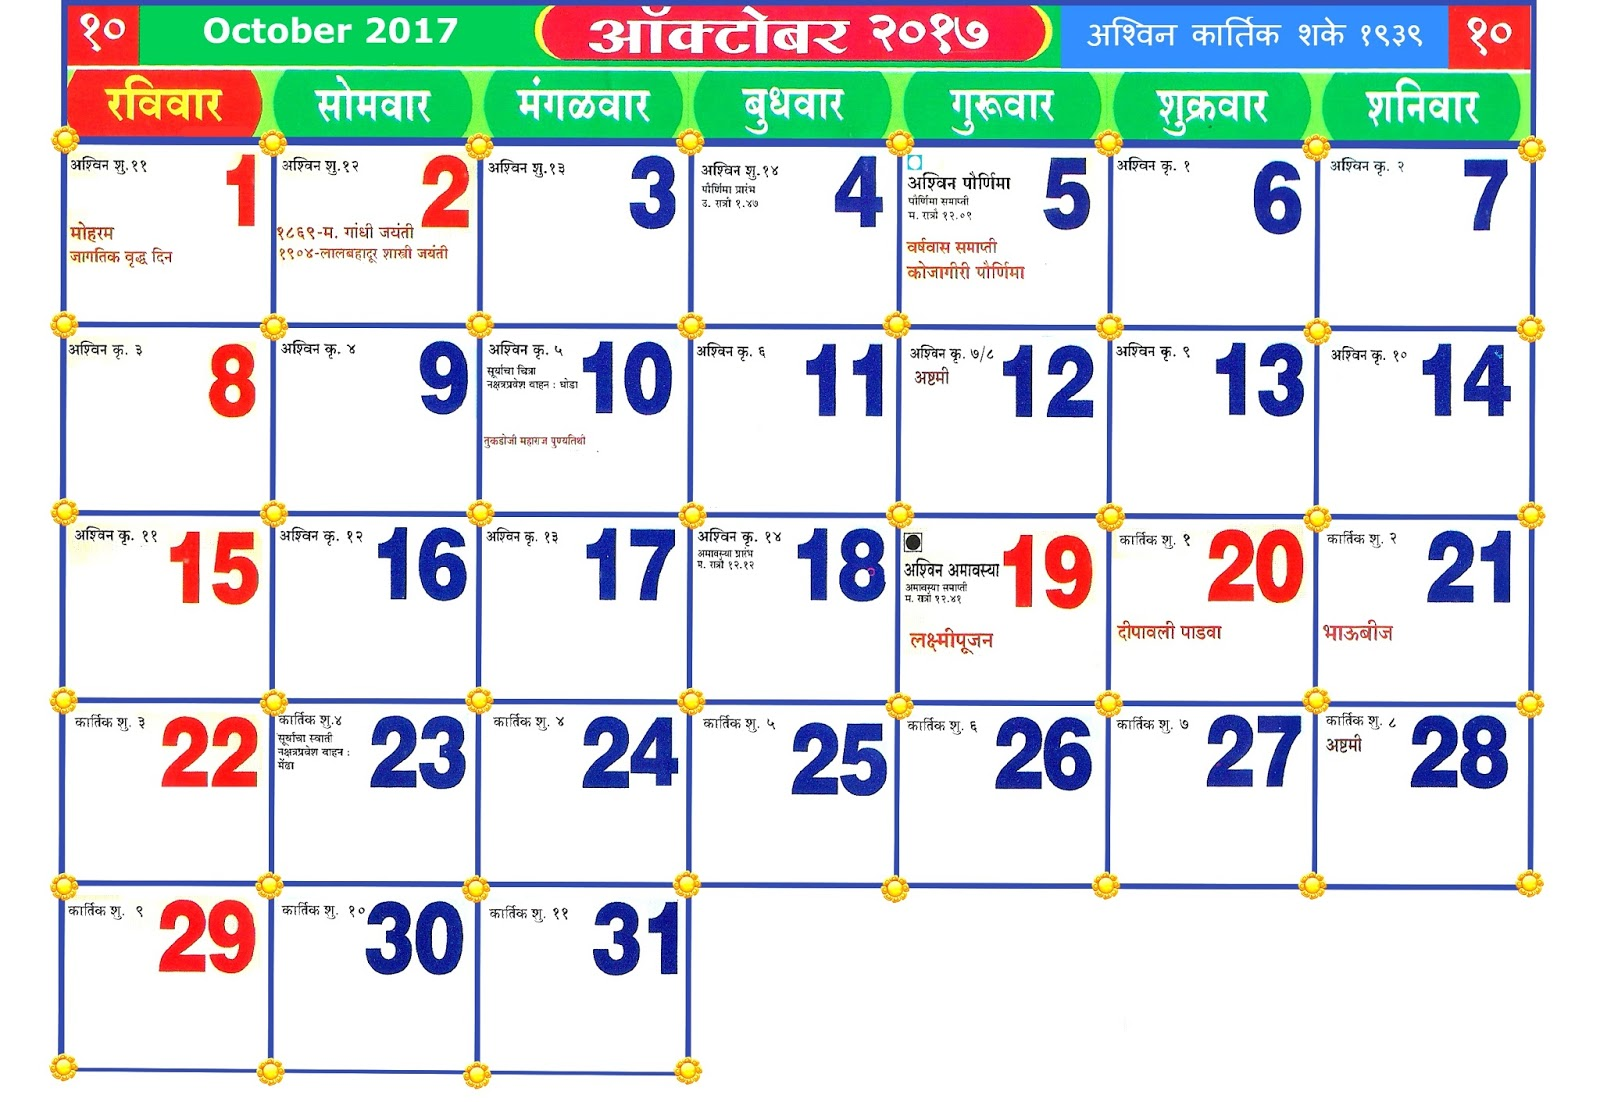 October 2017 Calendar Kalnirnay | Calendar Printable 2017